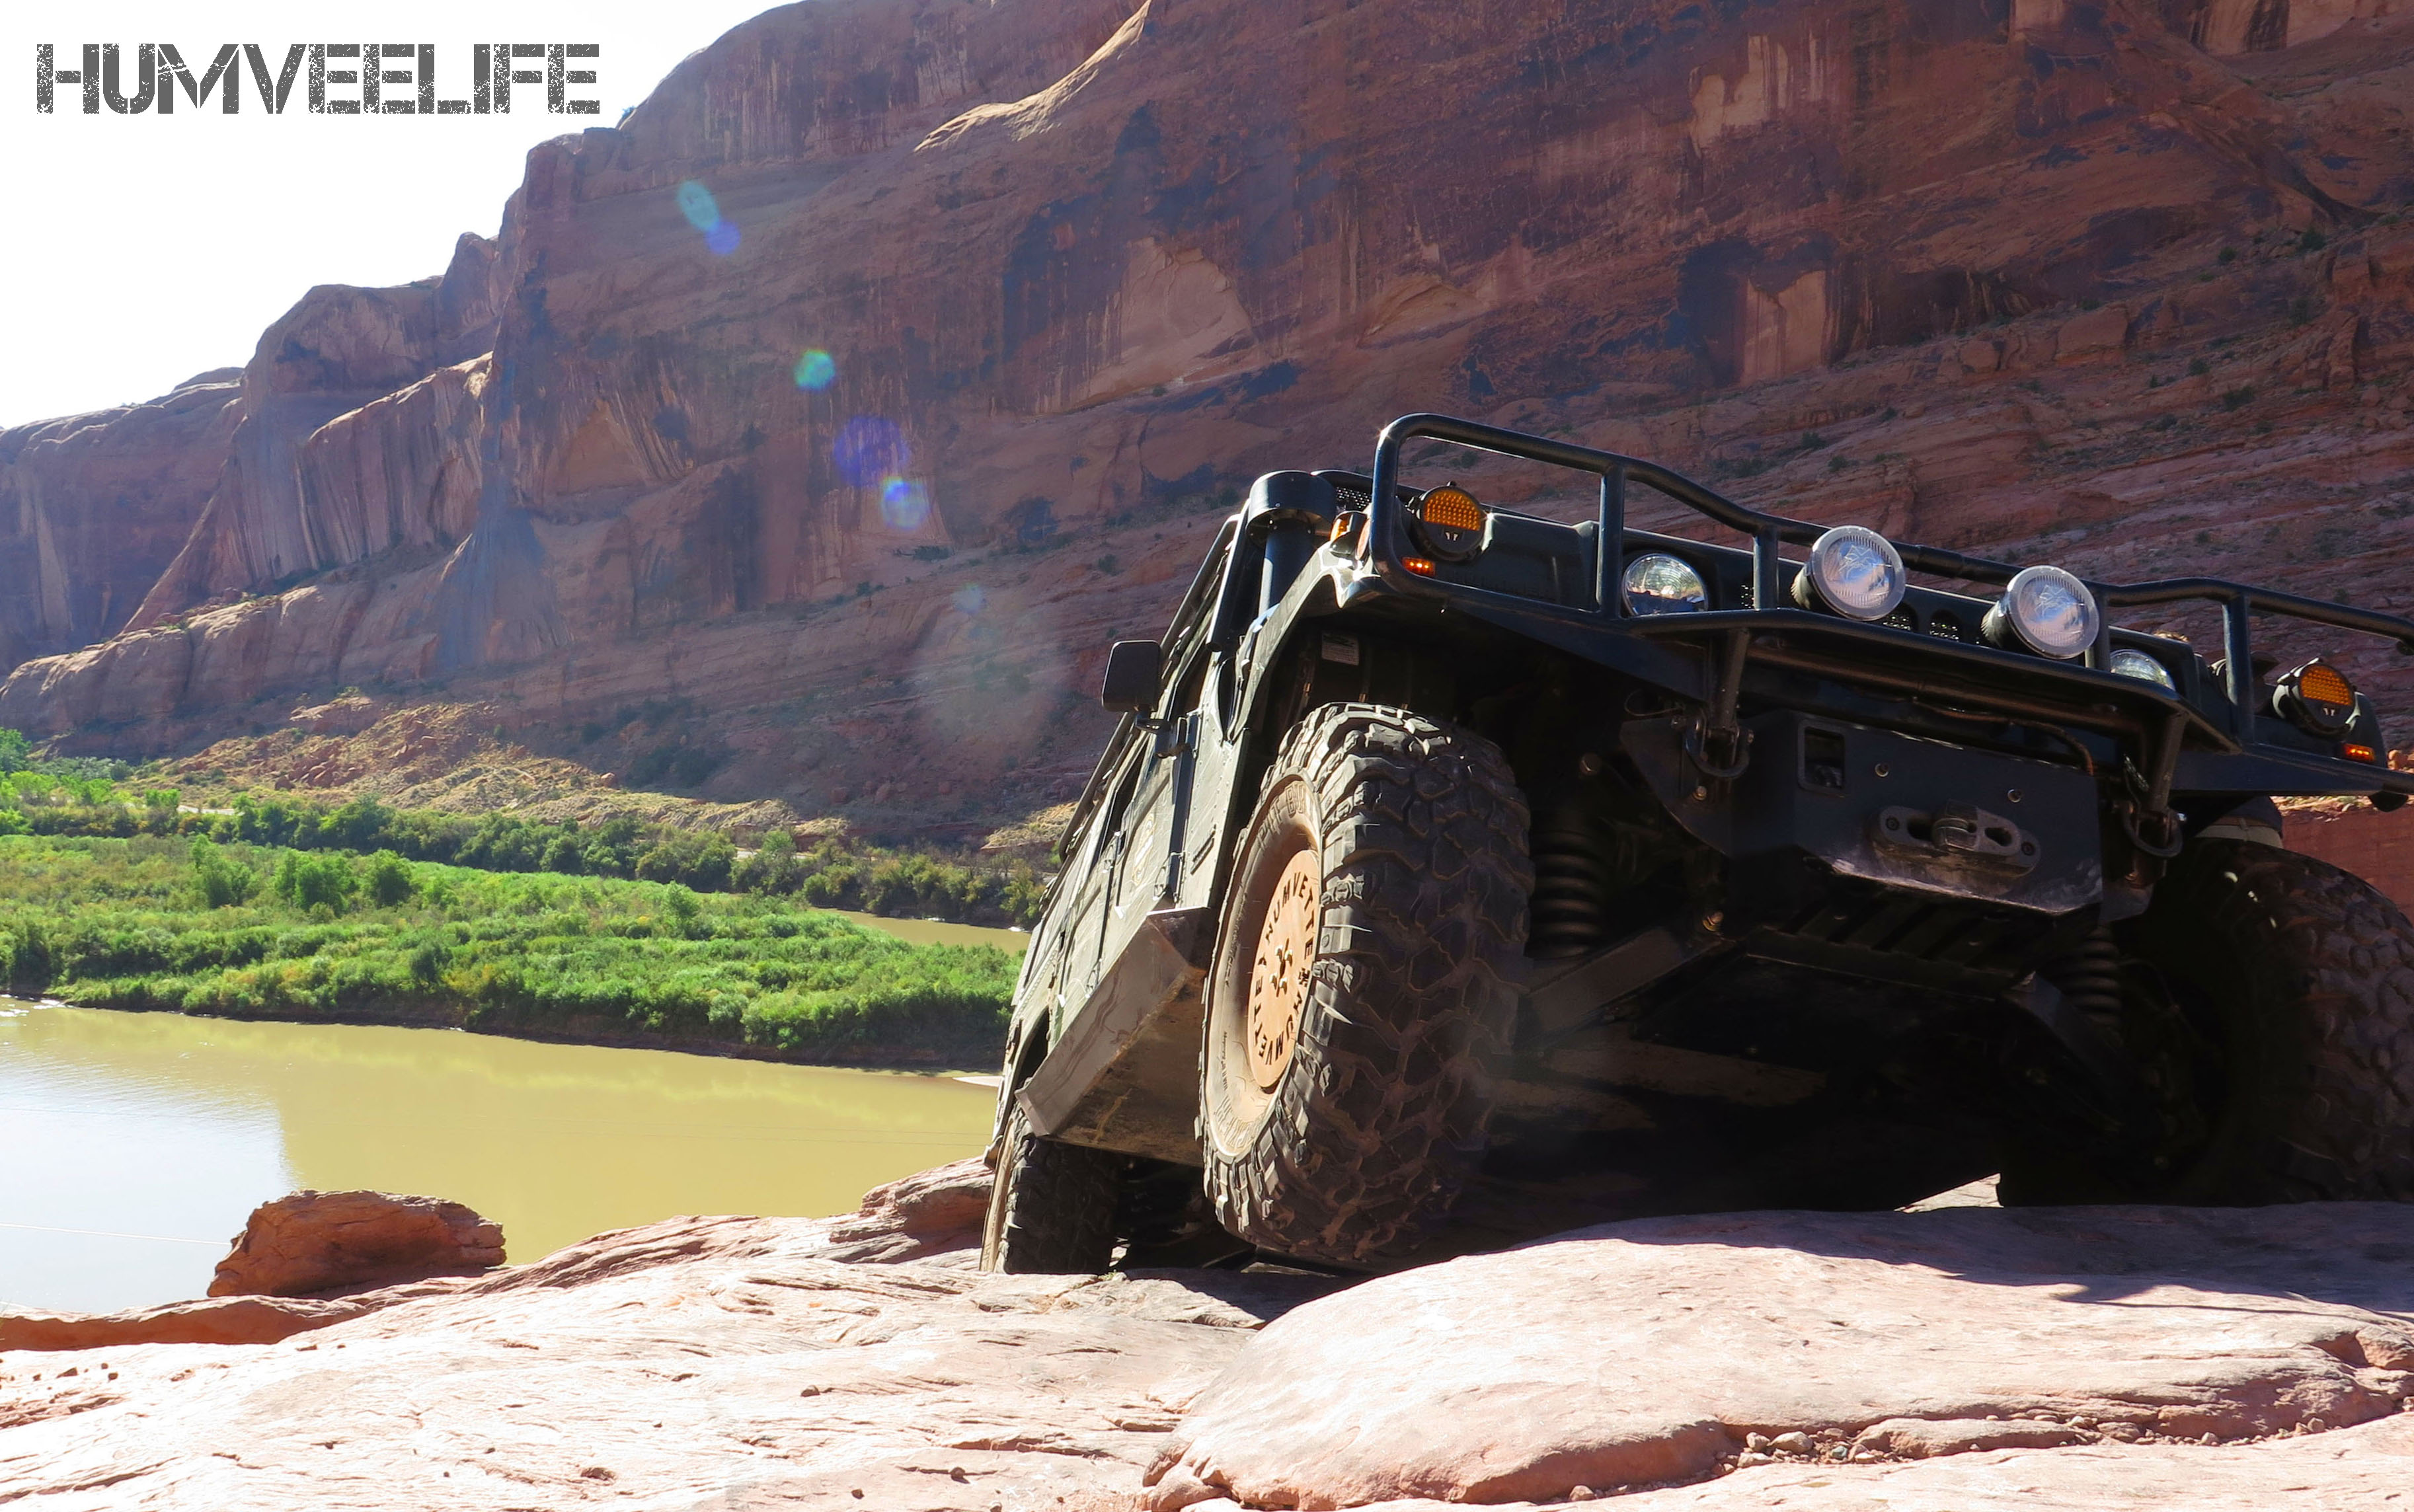 HumveeLife Moab 2015 - Pack 2 #5C